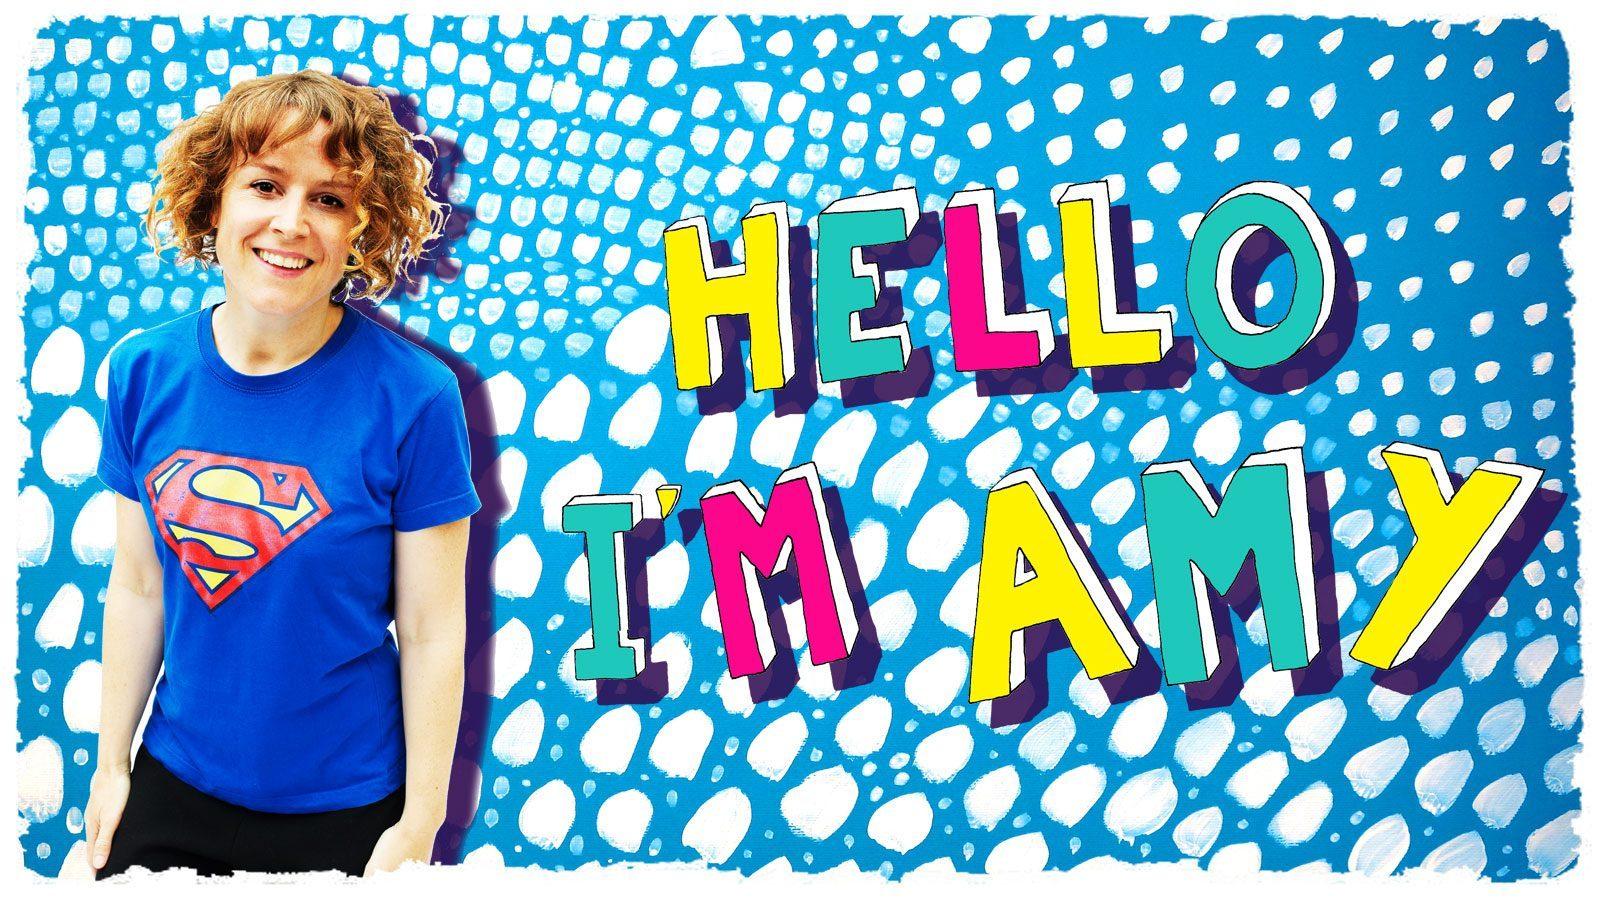 Hello It's Amy sensitive superheroine